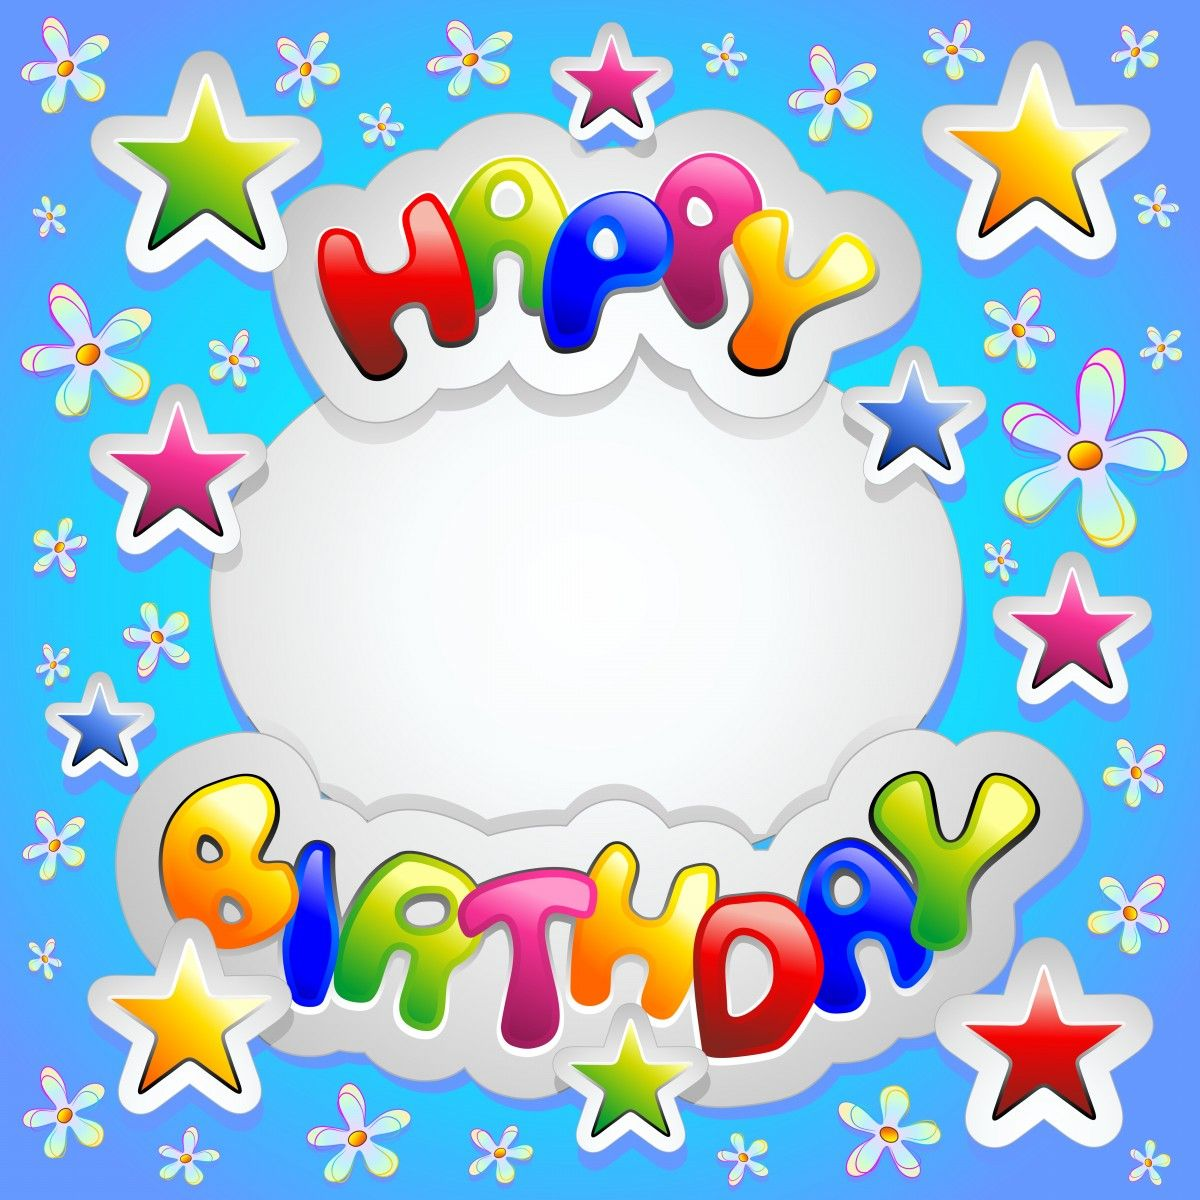 Kids Birthday Wishes: Happy Birthday Cards